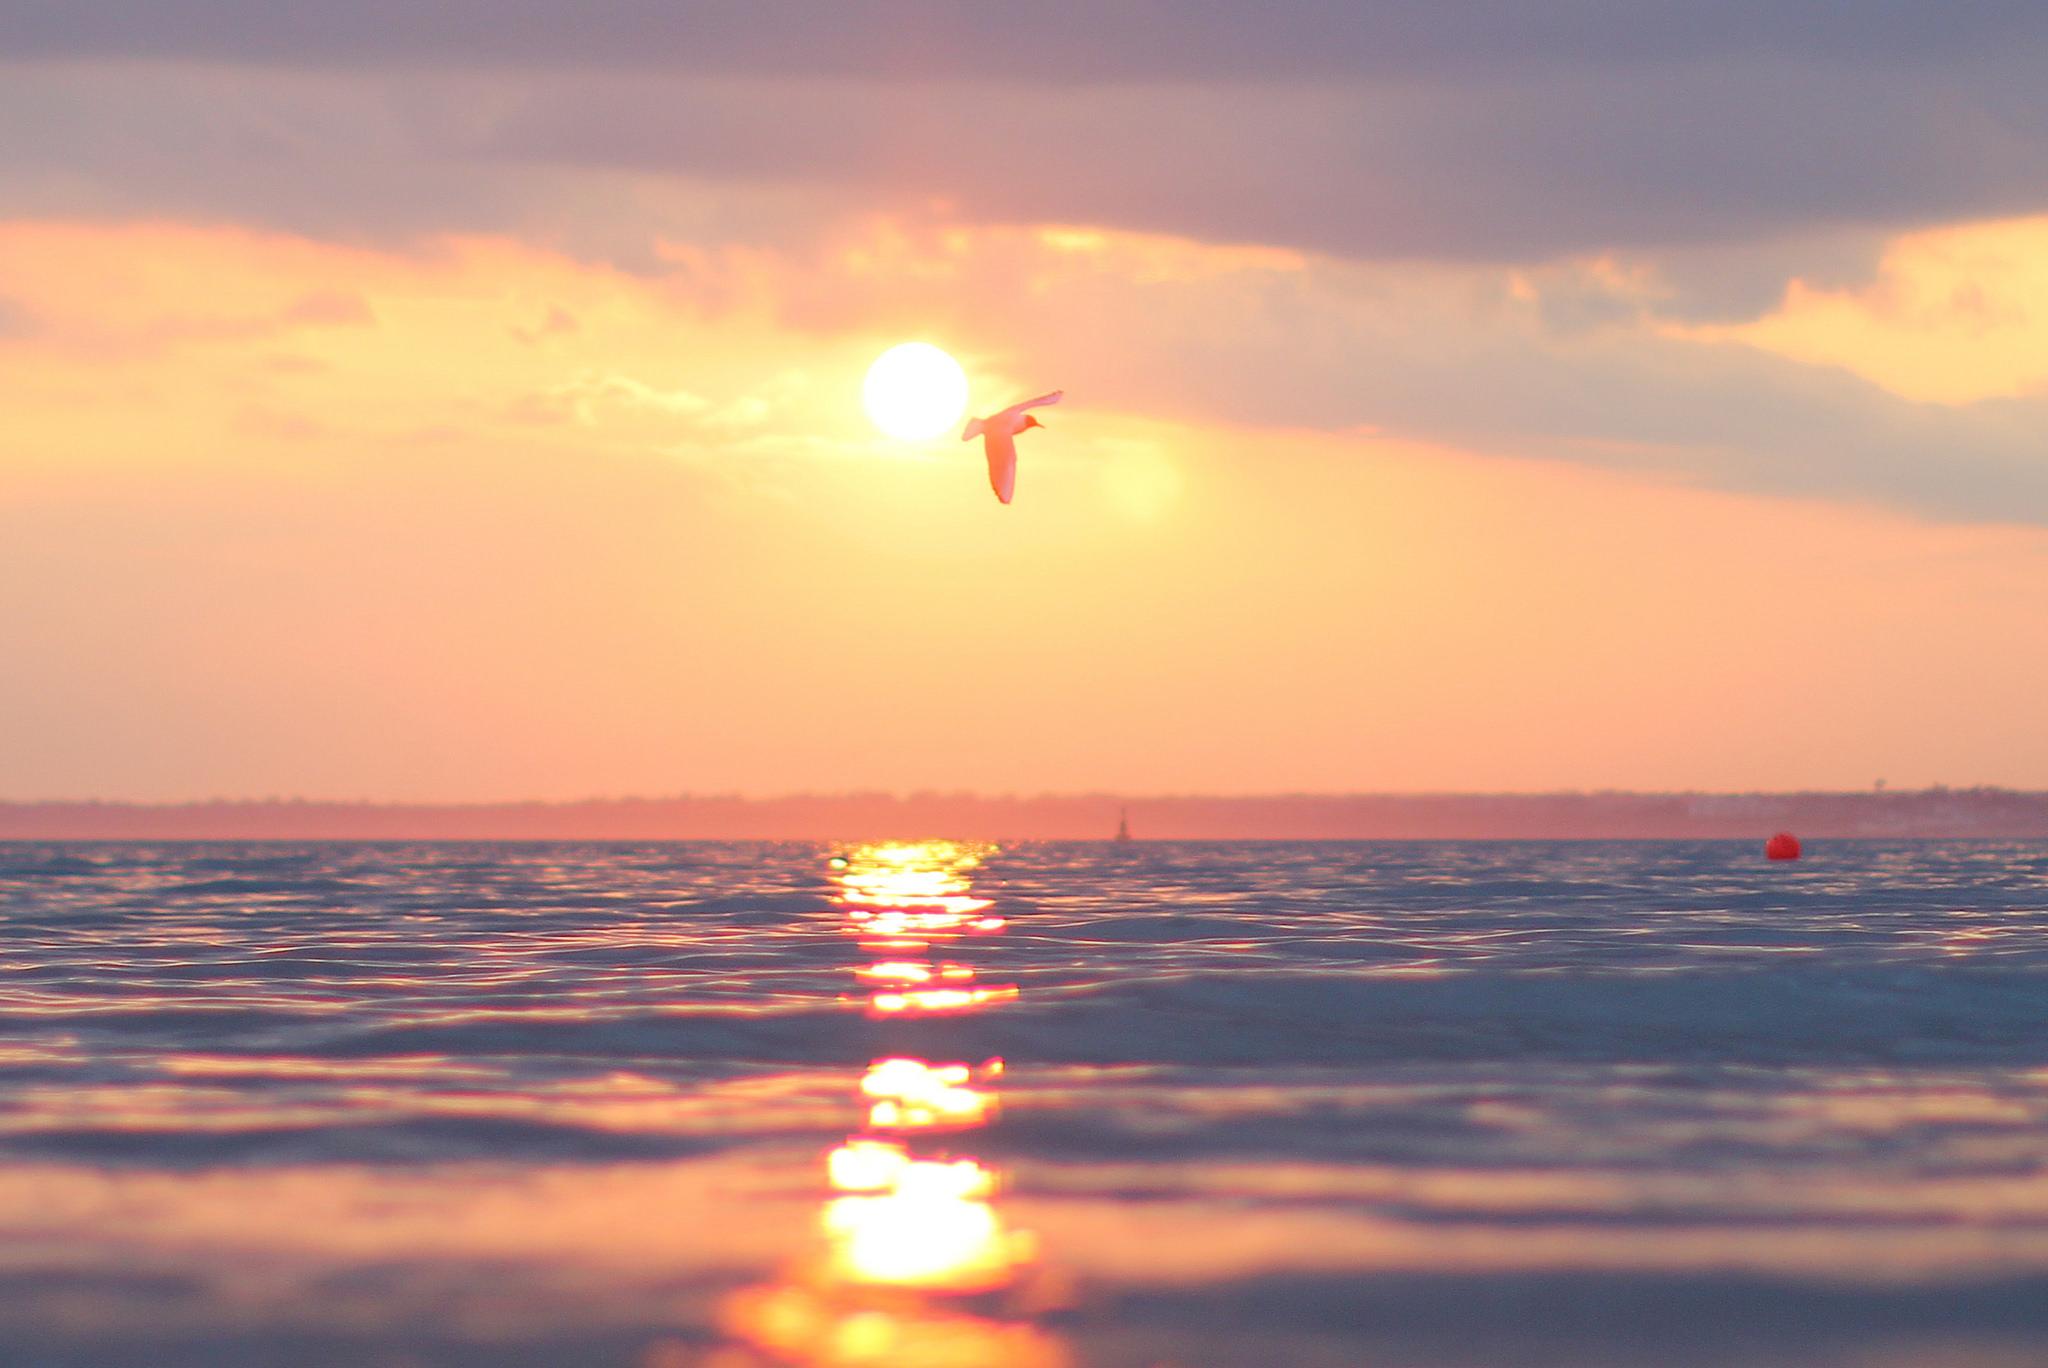 Best place for an Island Sundowner